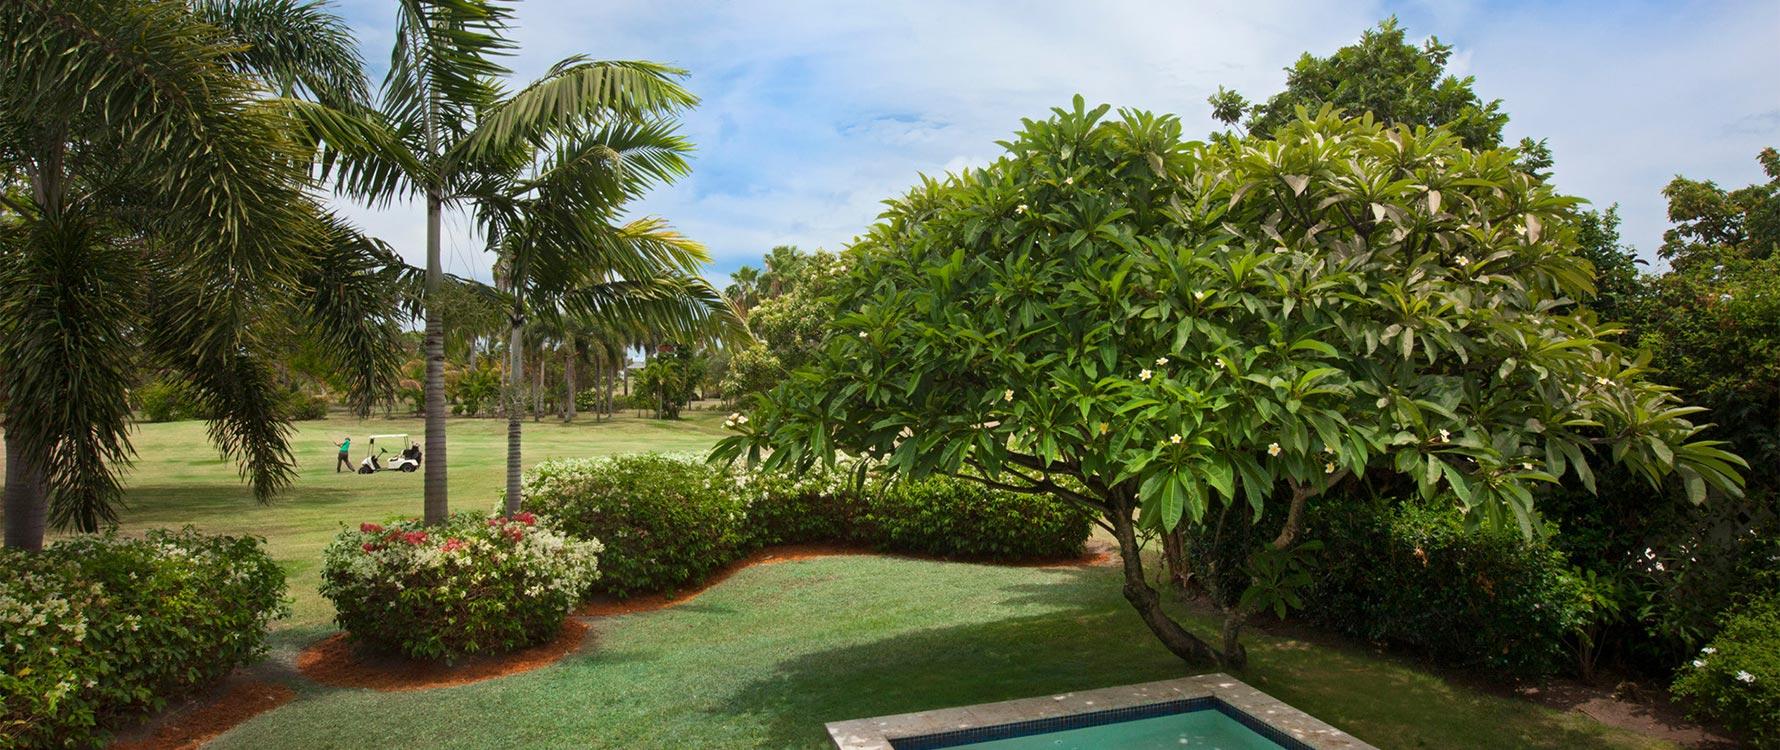 Pool and surrounding plants